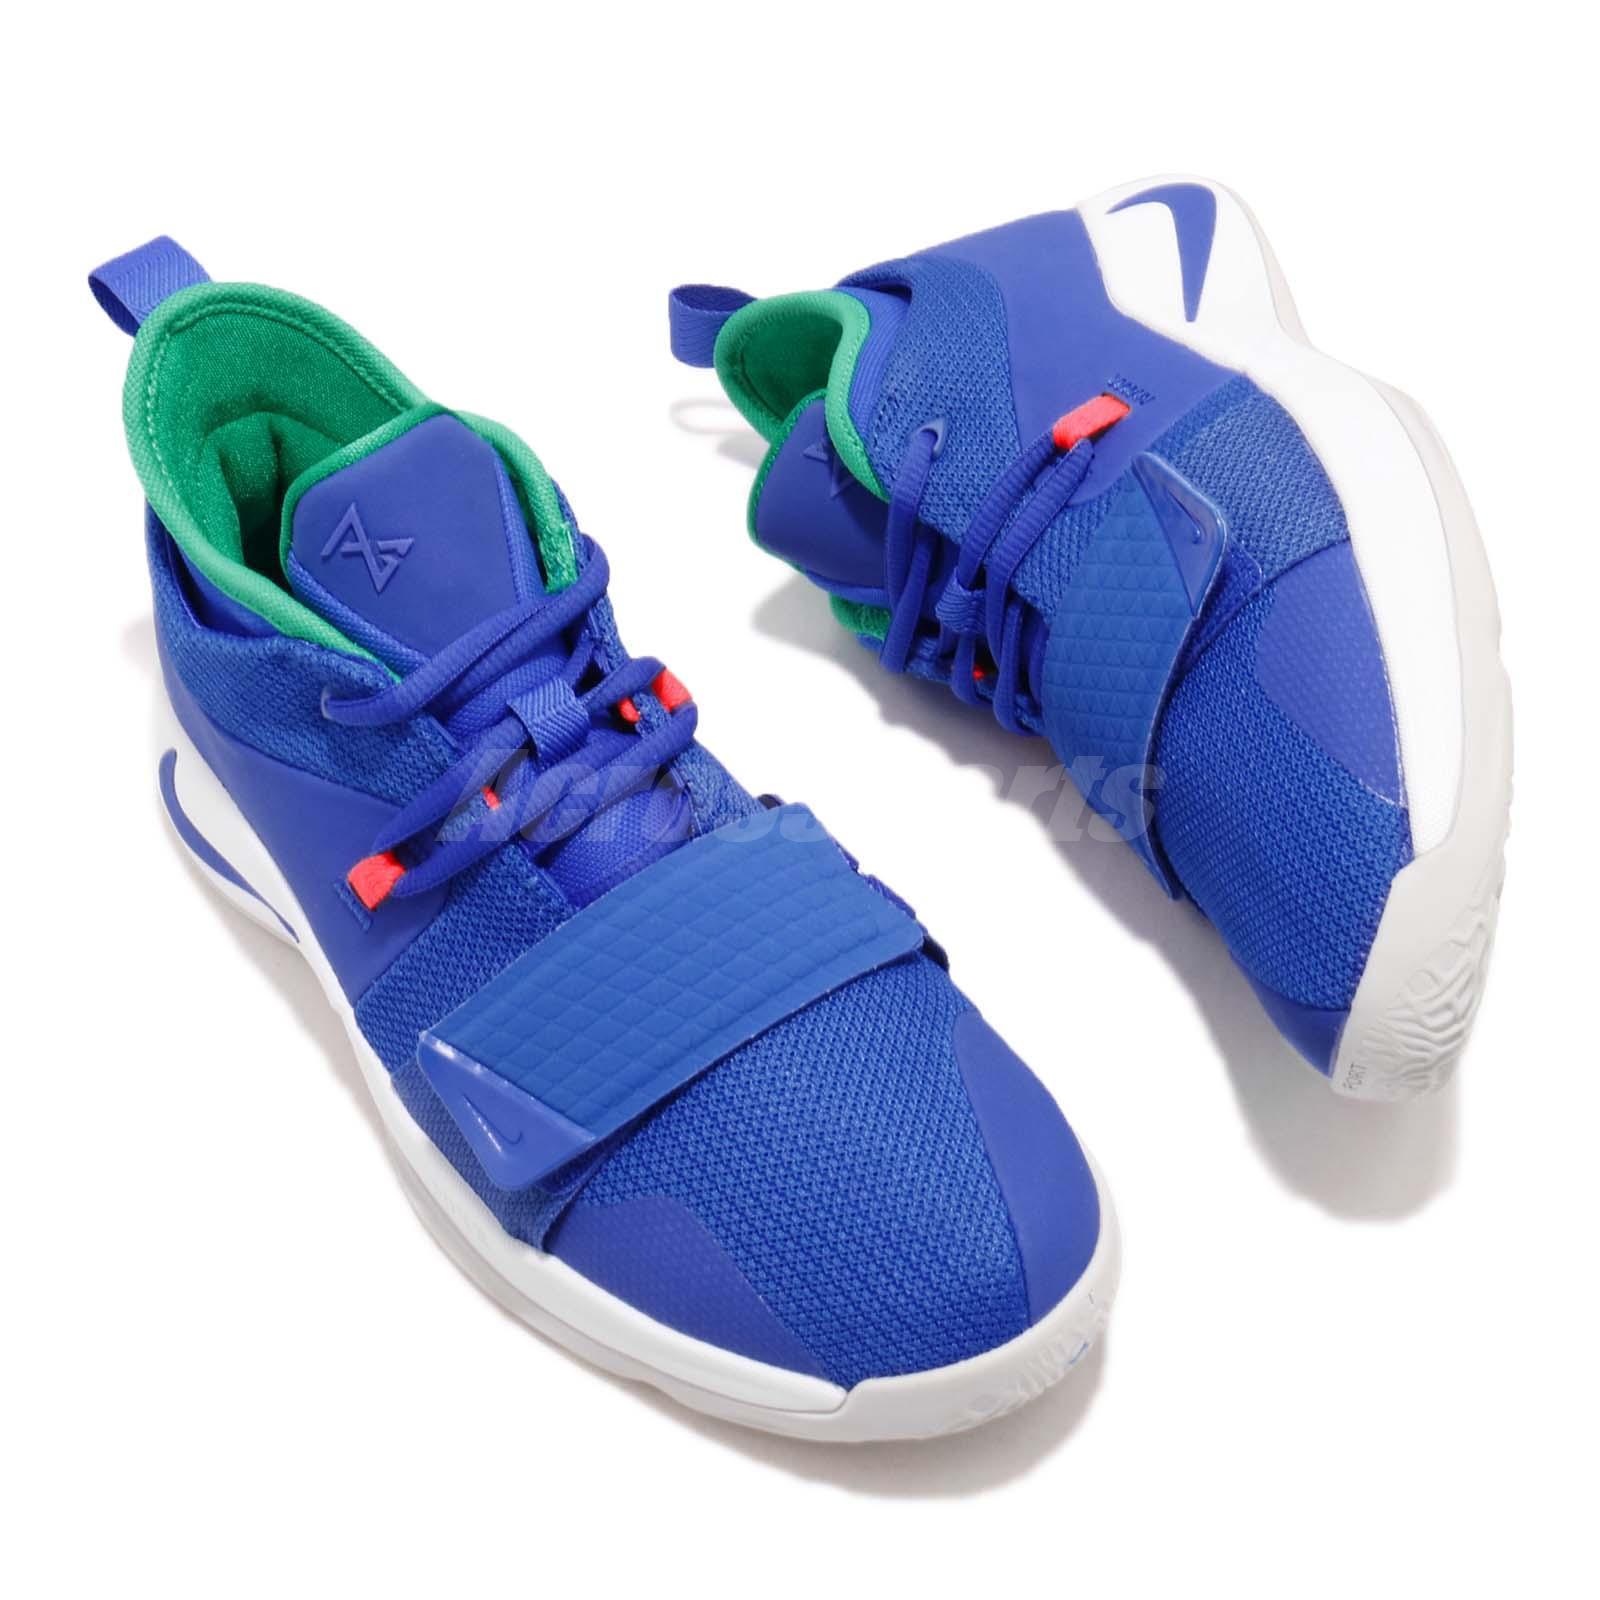 c44fce4923a0 Nike PG 2.5 grade-school Paul George Racer Azul Niño Jóvenes Mujeres ...